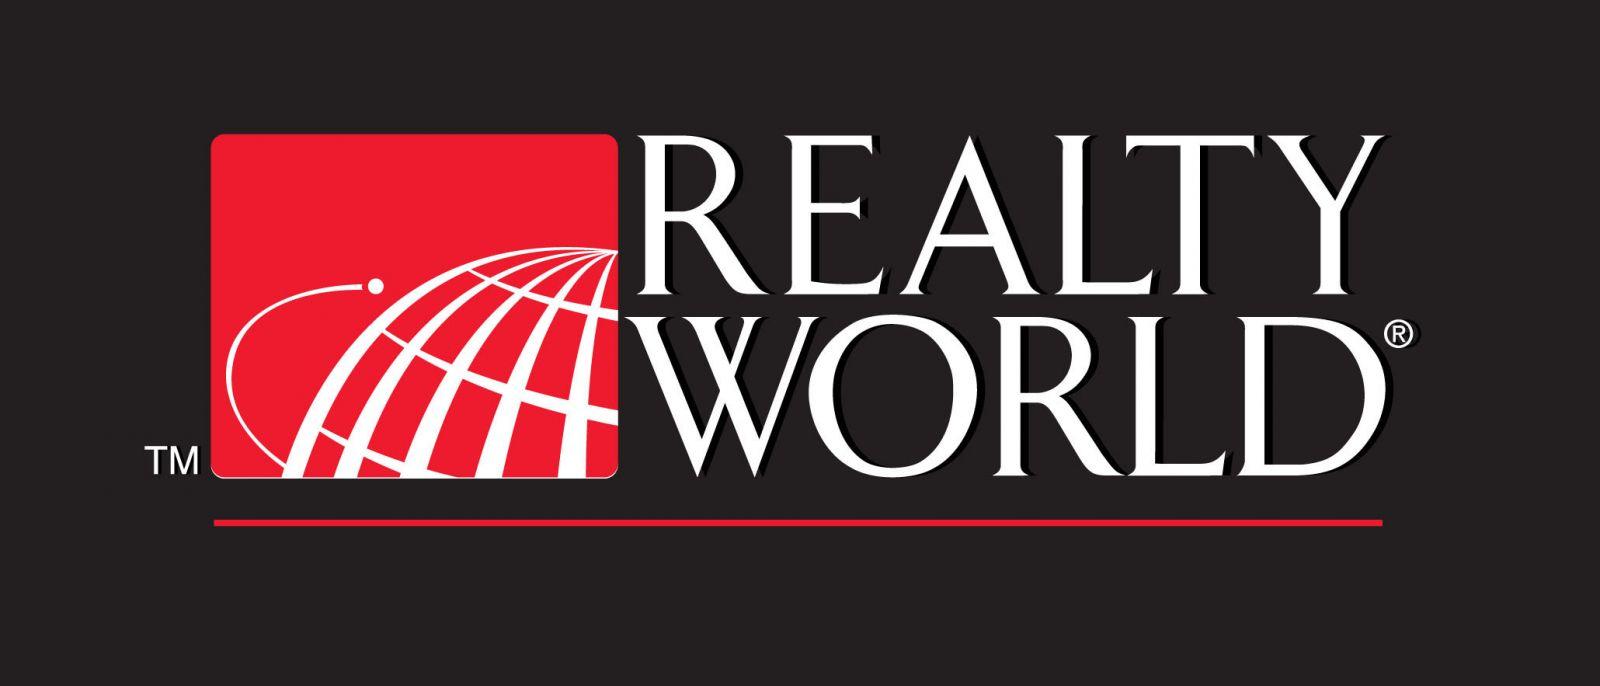 Realty World Inc.